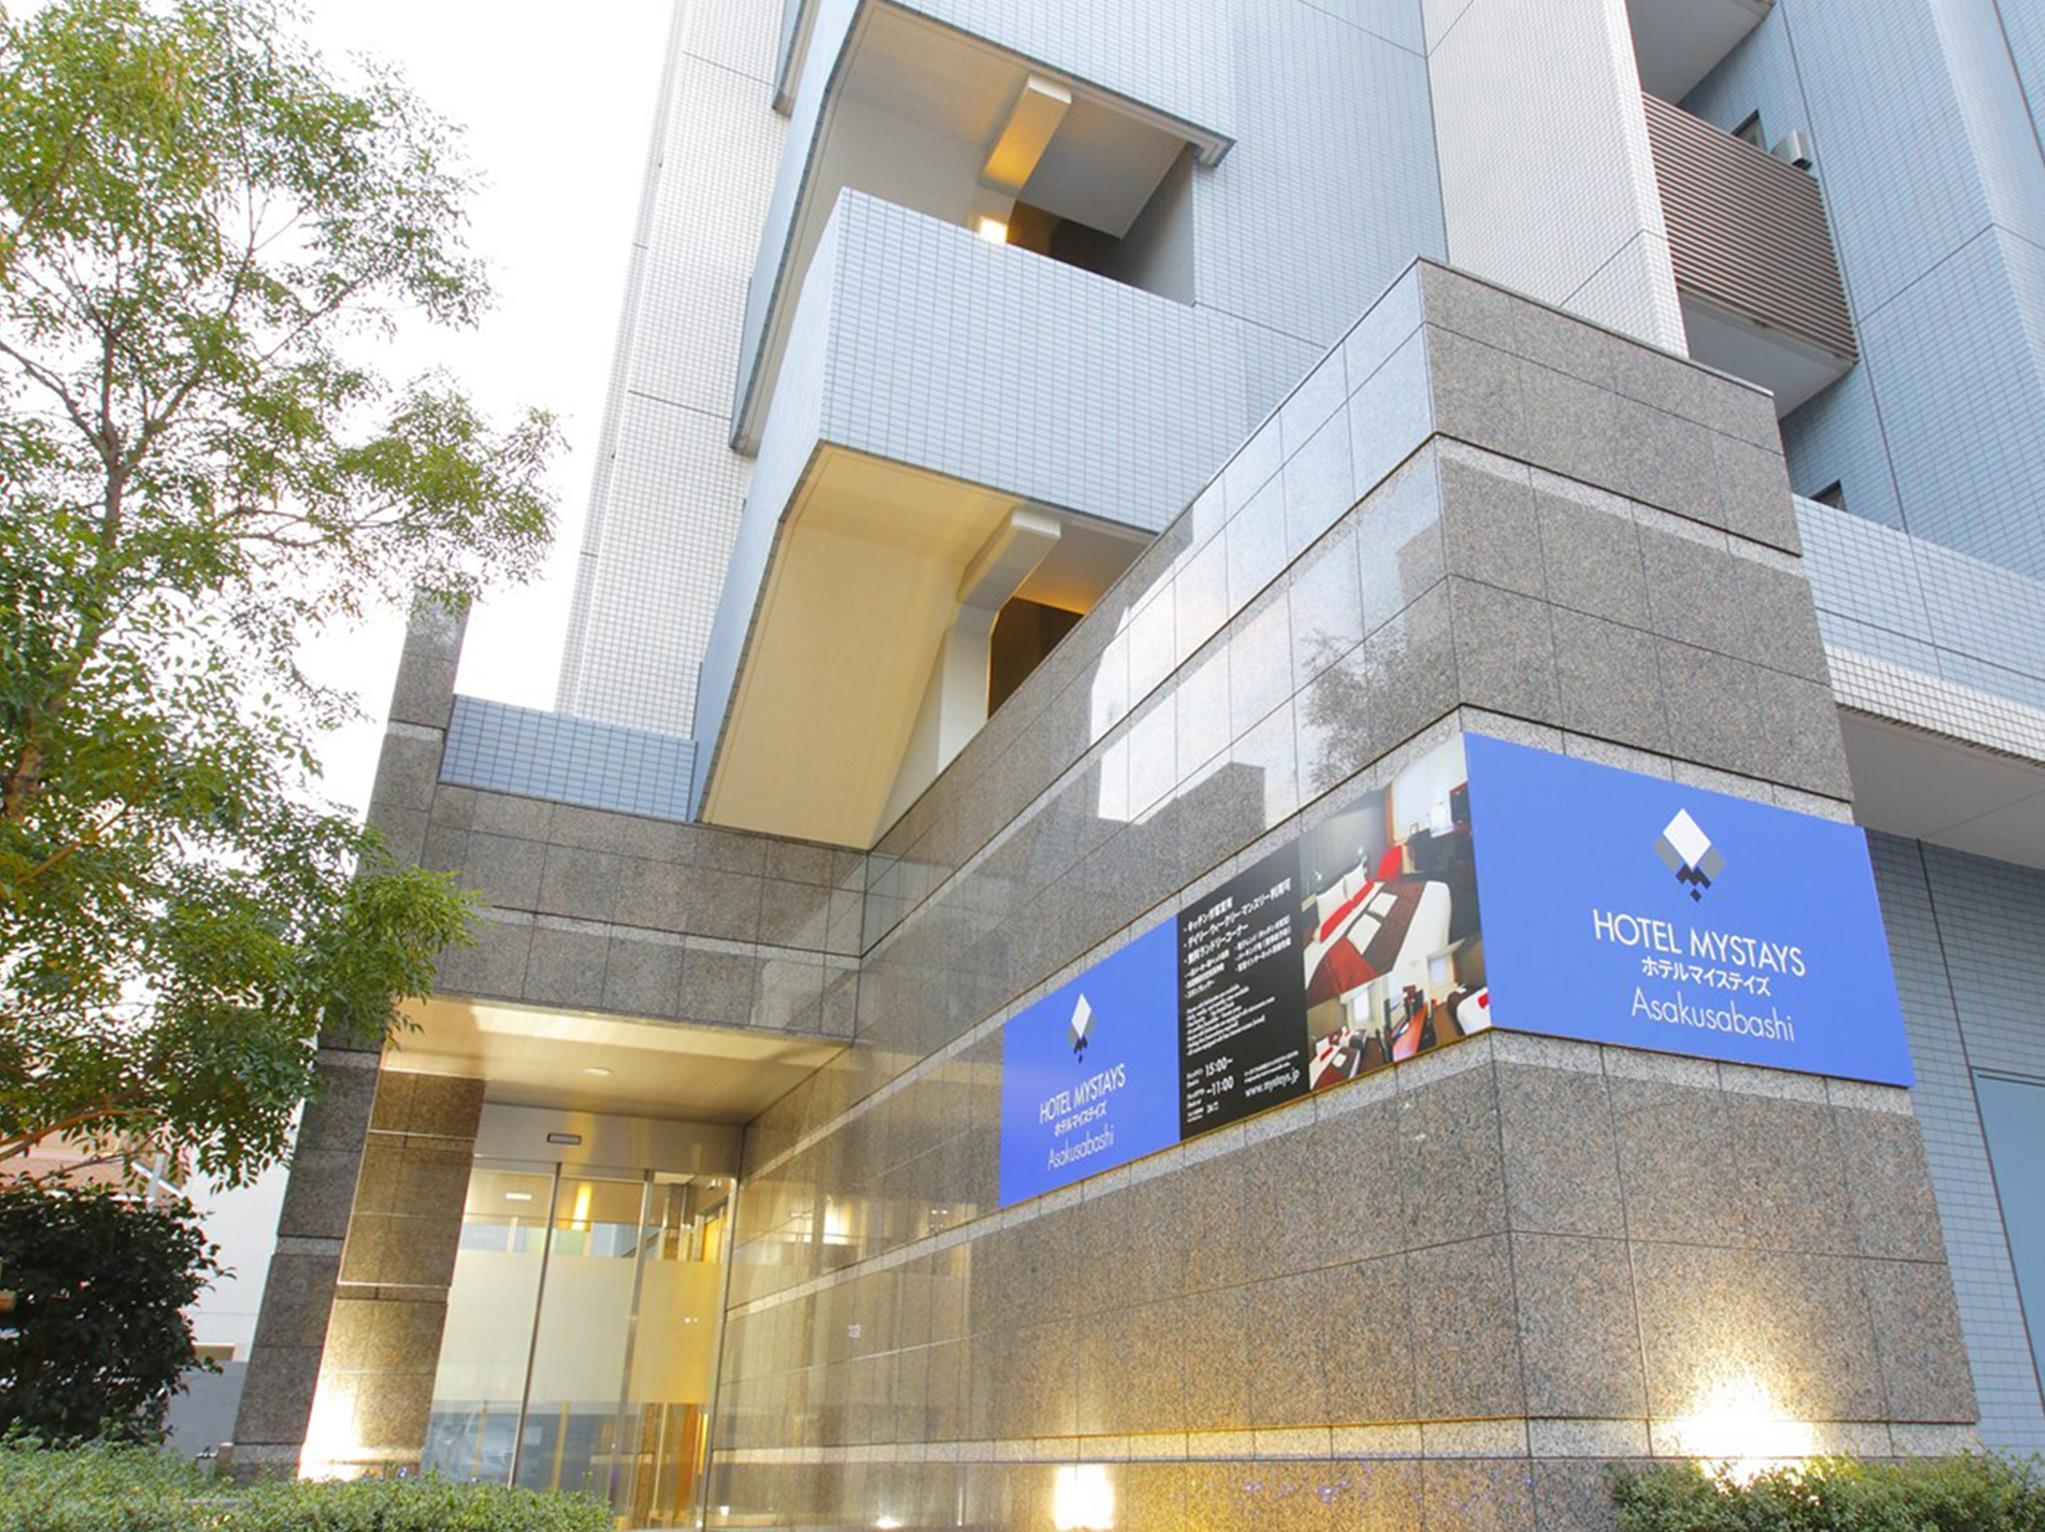 Hotel MyStays Asakusa-bashi Tokyo